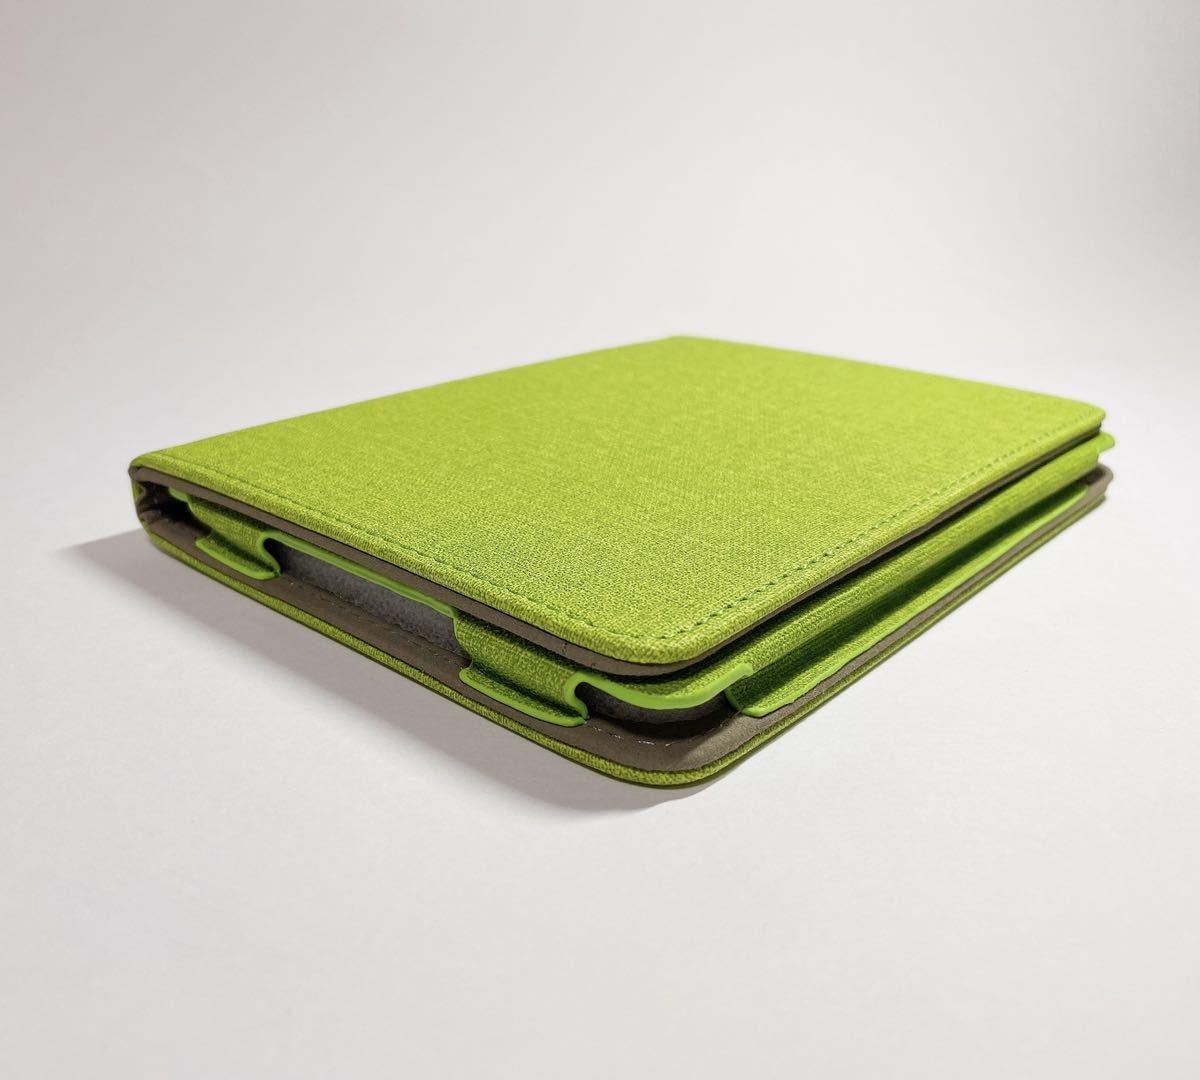 Kindle Paperwhite 全世代通用の保護カバー ケース